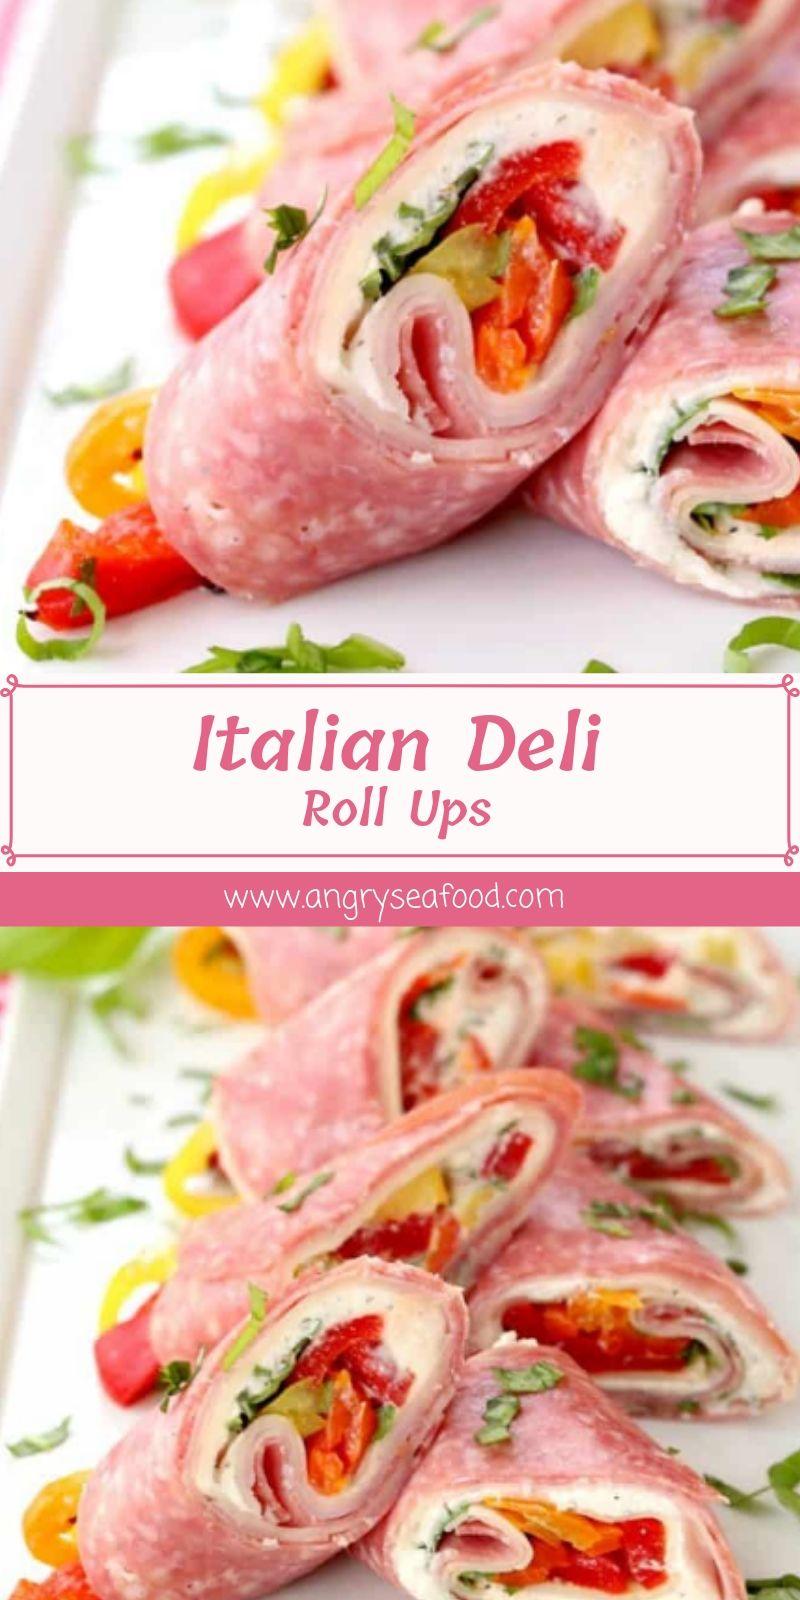 Italian Deli Roll Ups